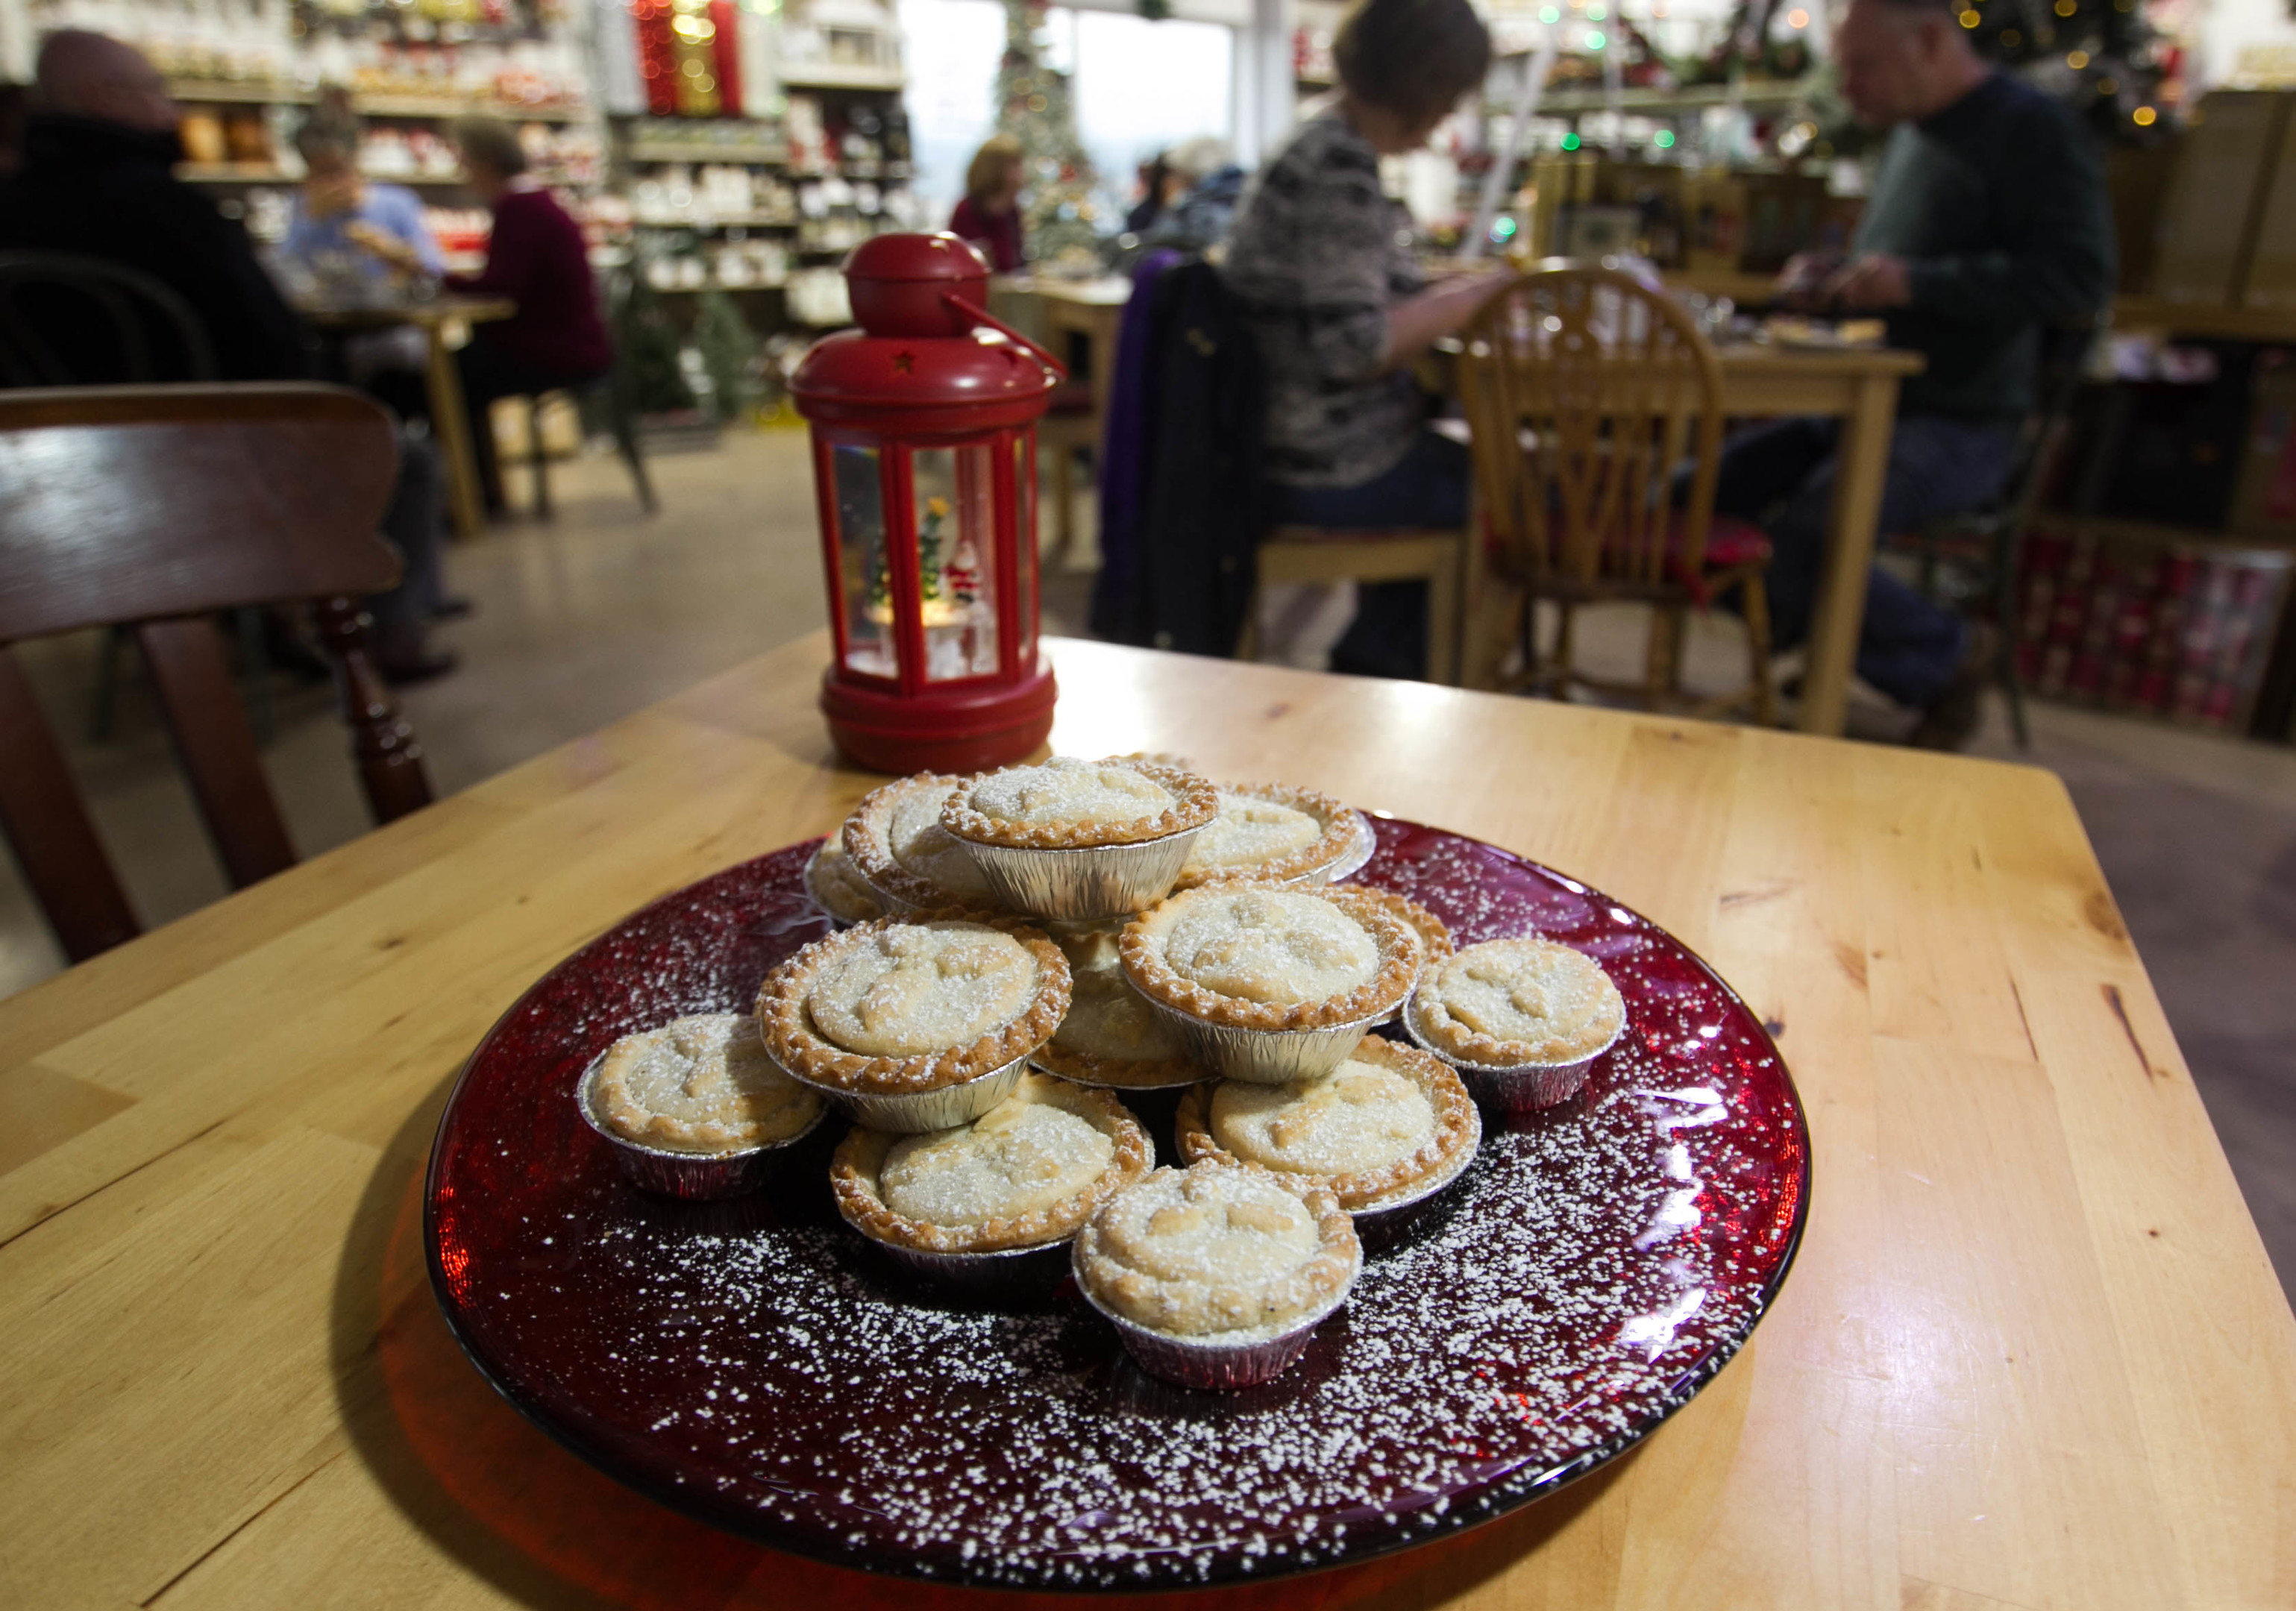 Pine Cone Cafe (Chris Austin / DC Thomson)